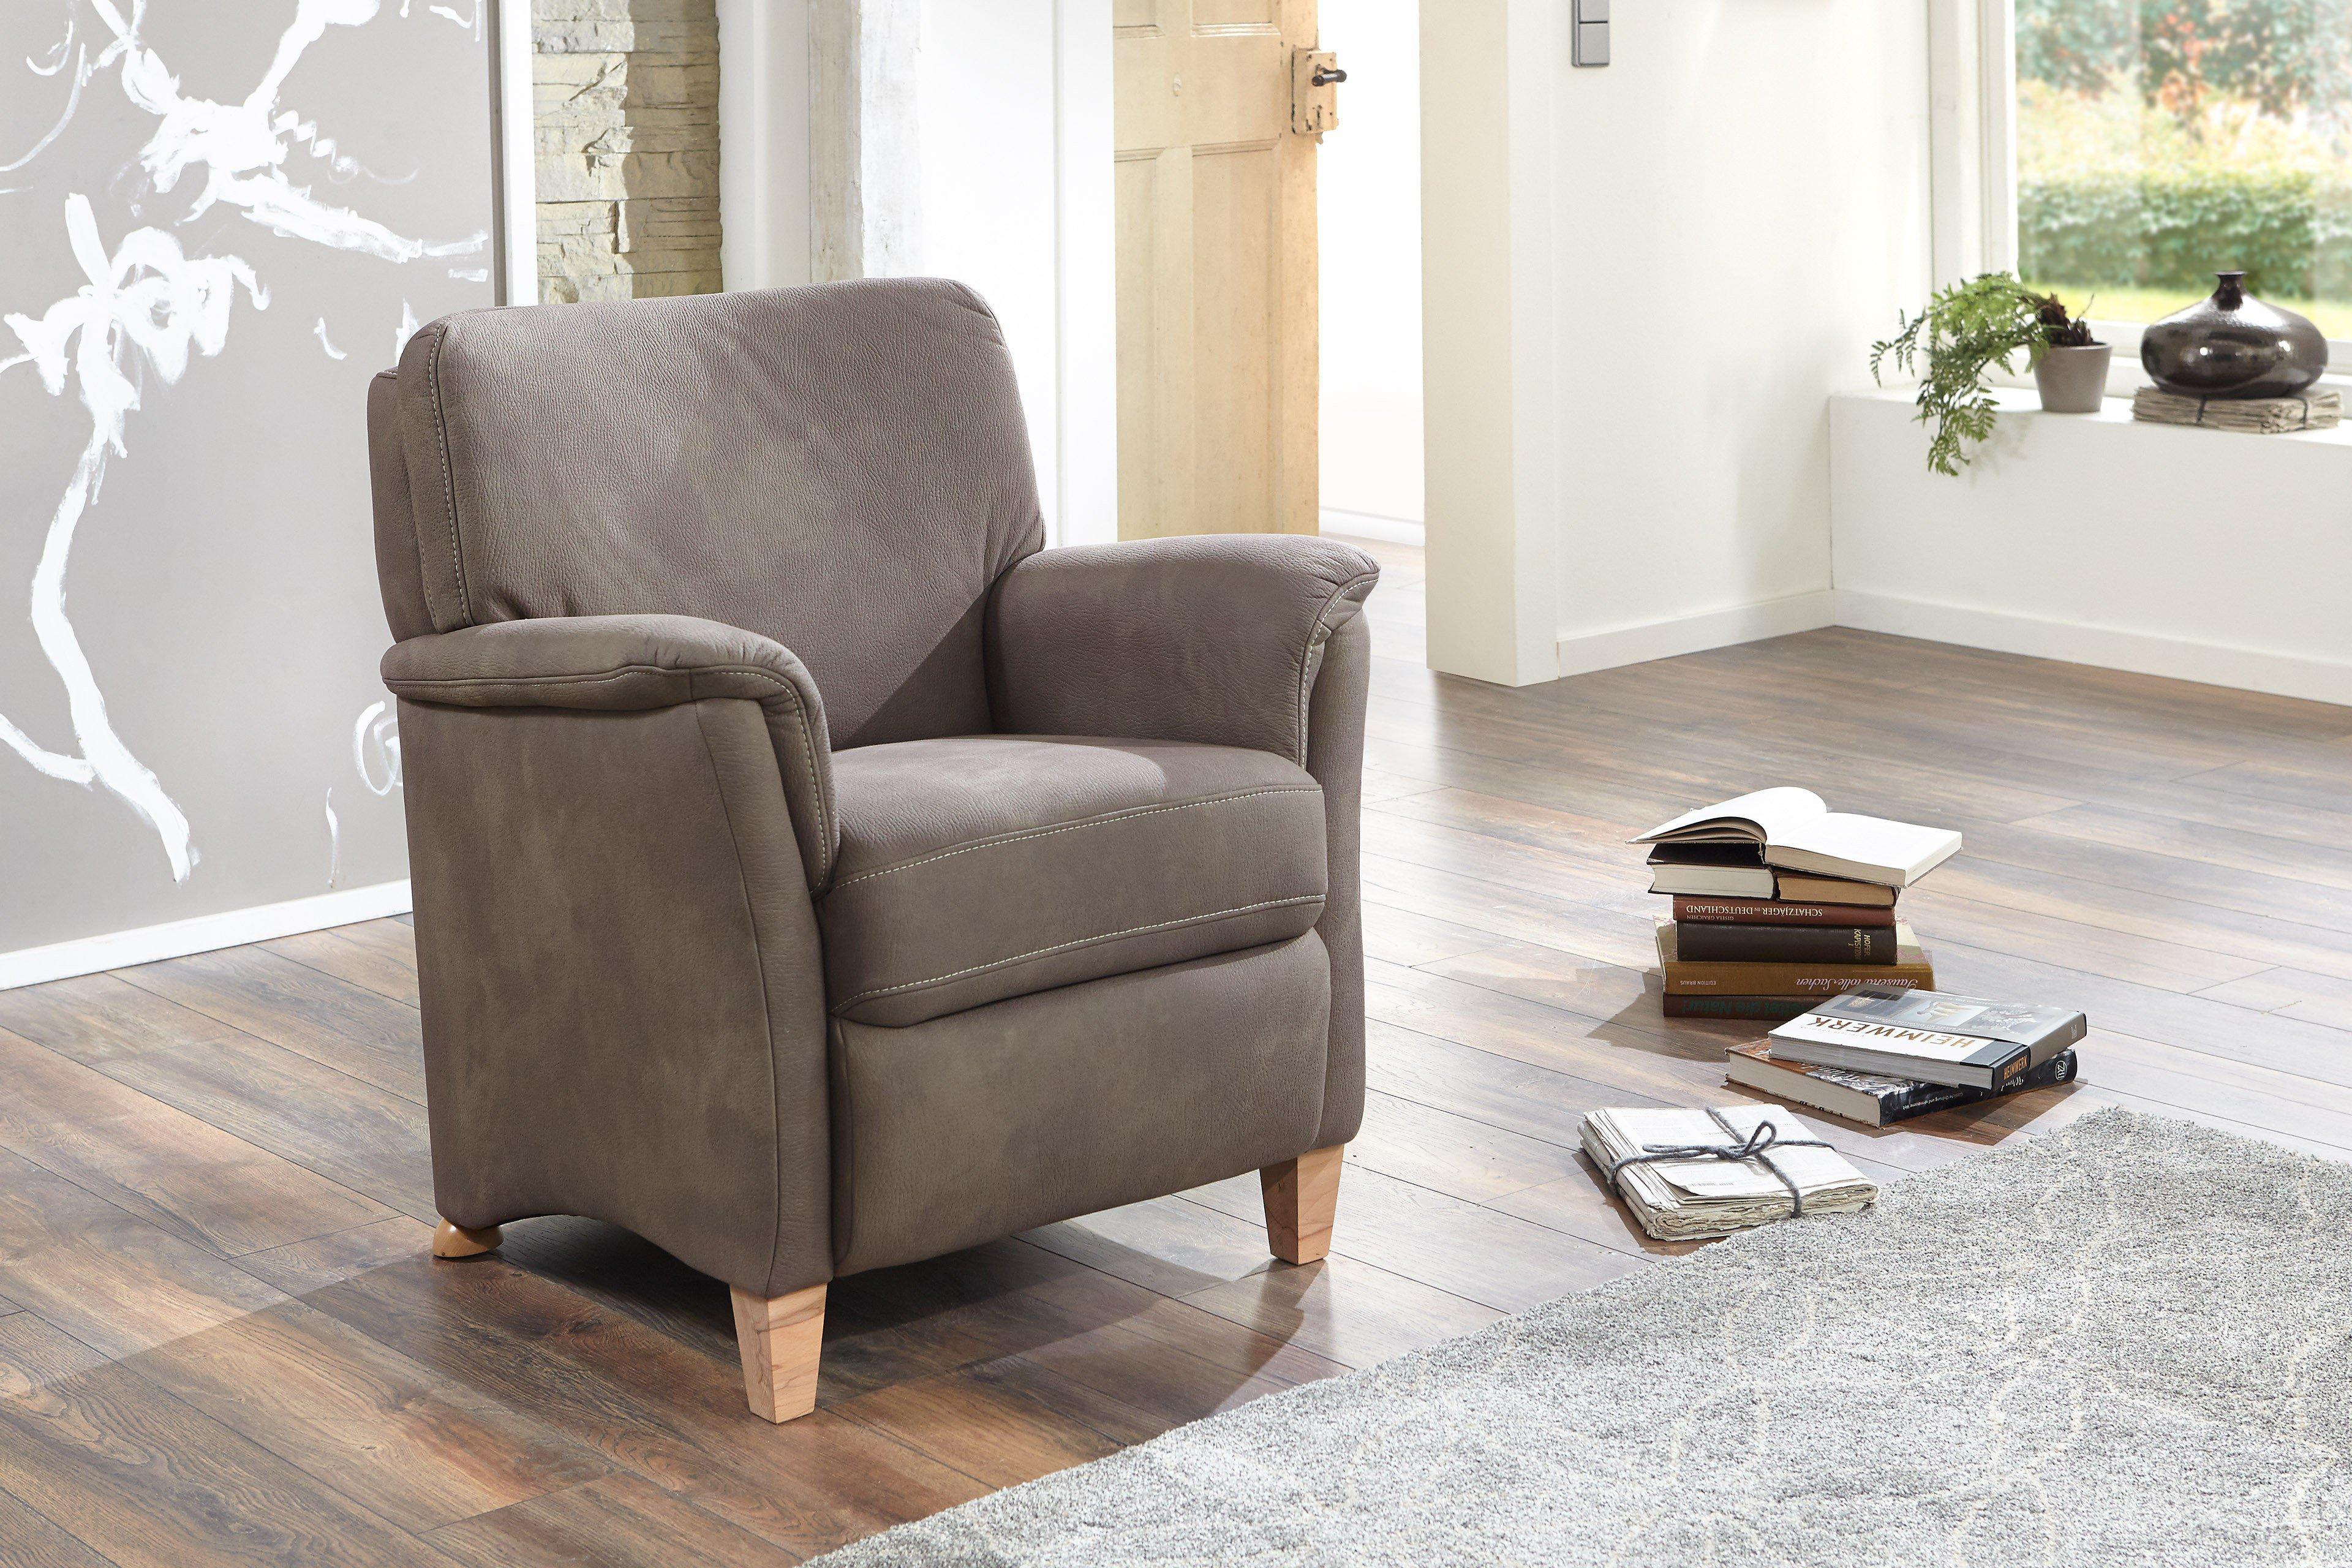 Polipol Comfortsessel Flinn nougat | Möbel Letz - Ihr Online-Shop